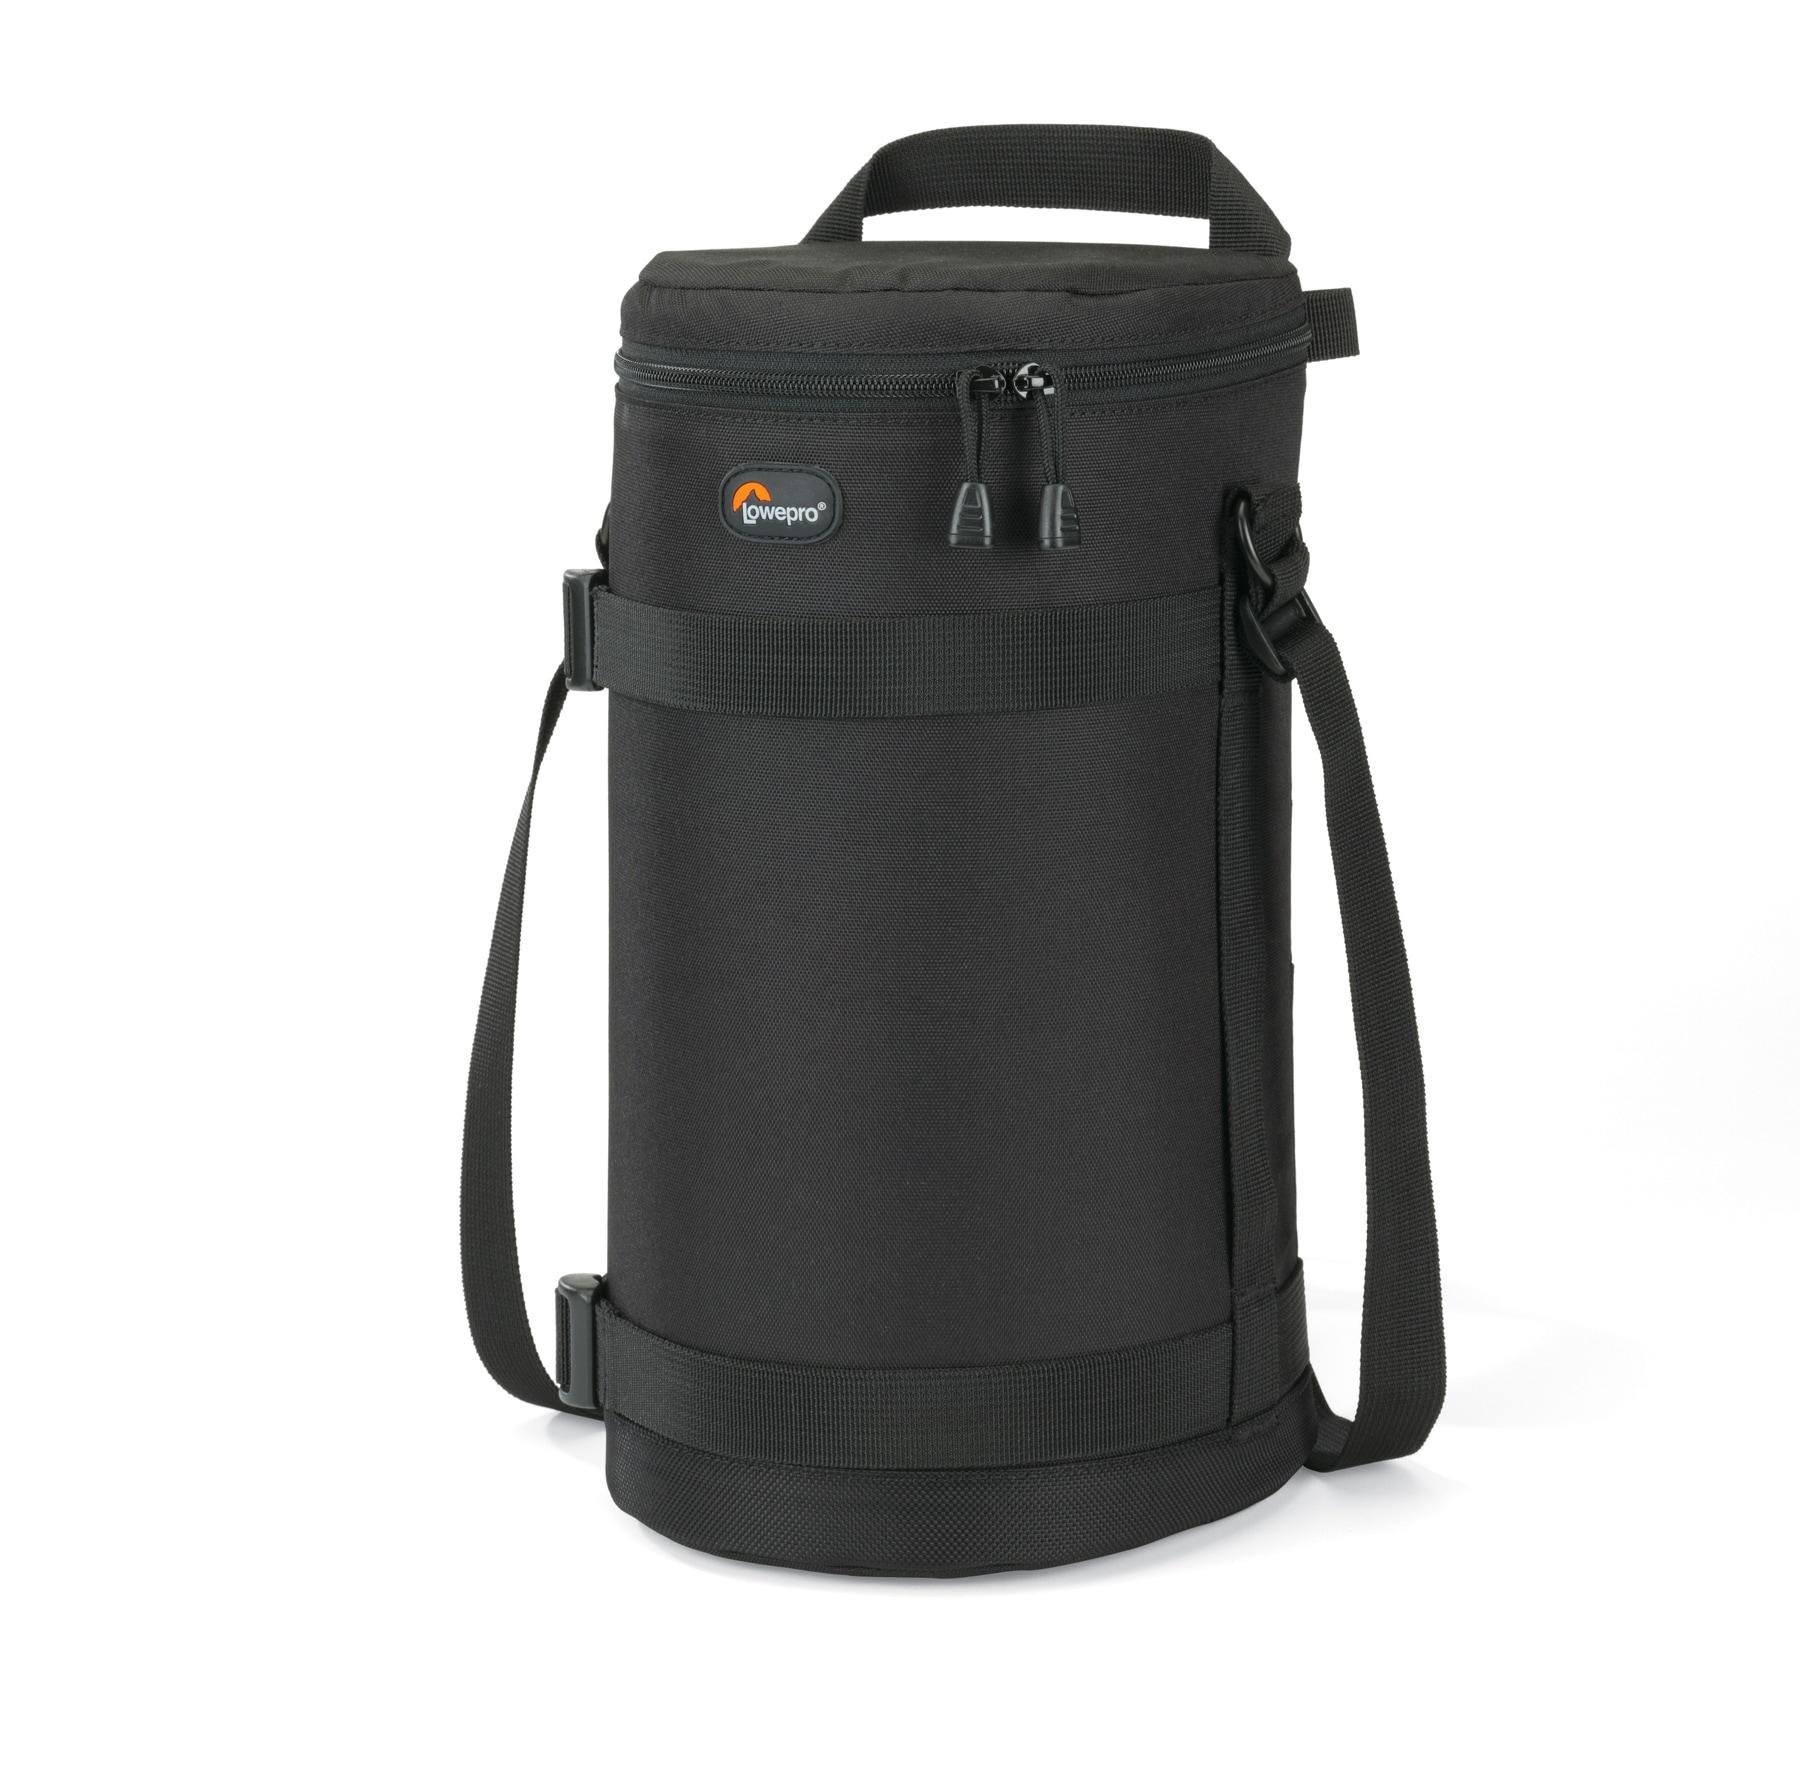 Lowepro Lens Case 13 X 32 (Black)